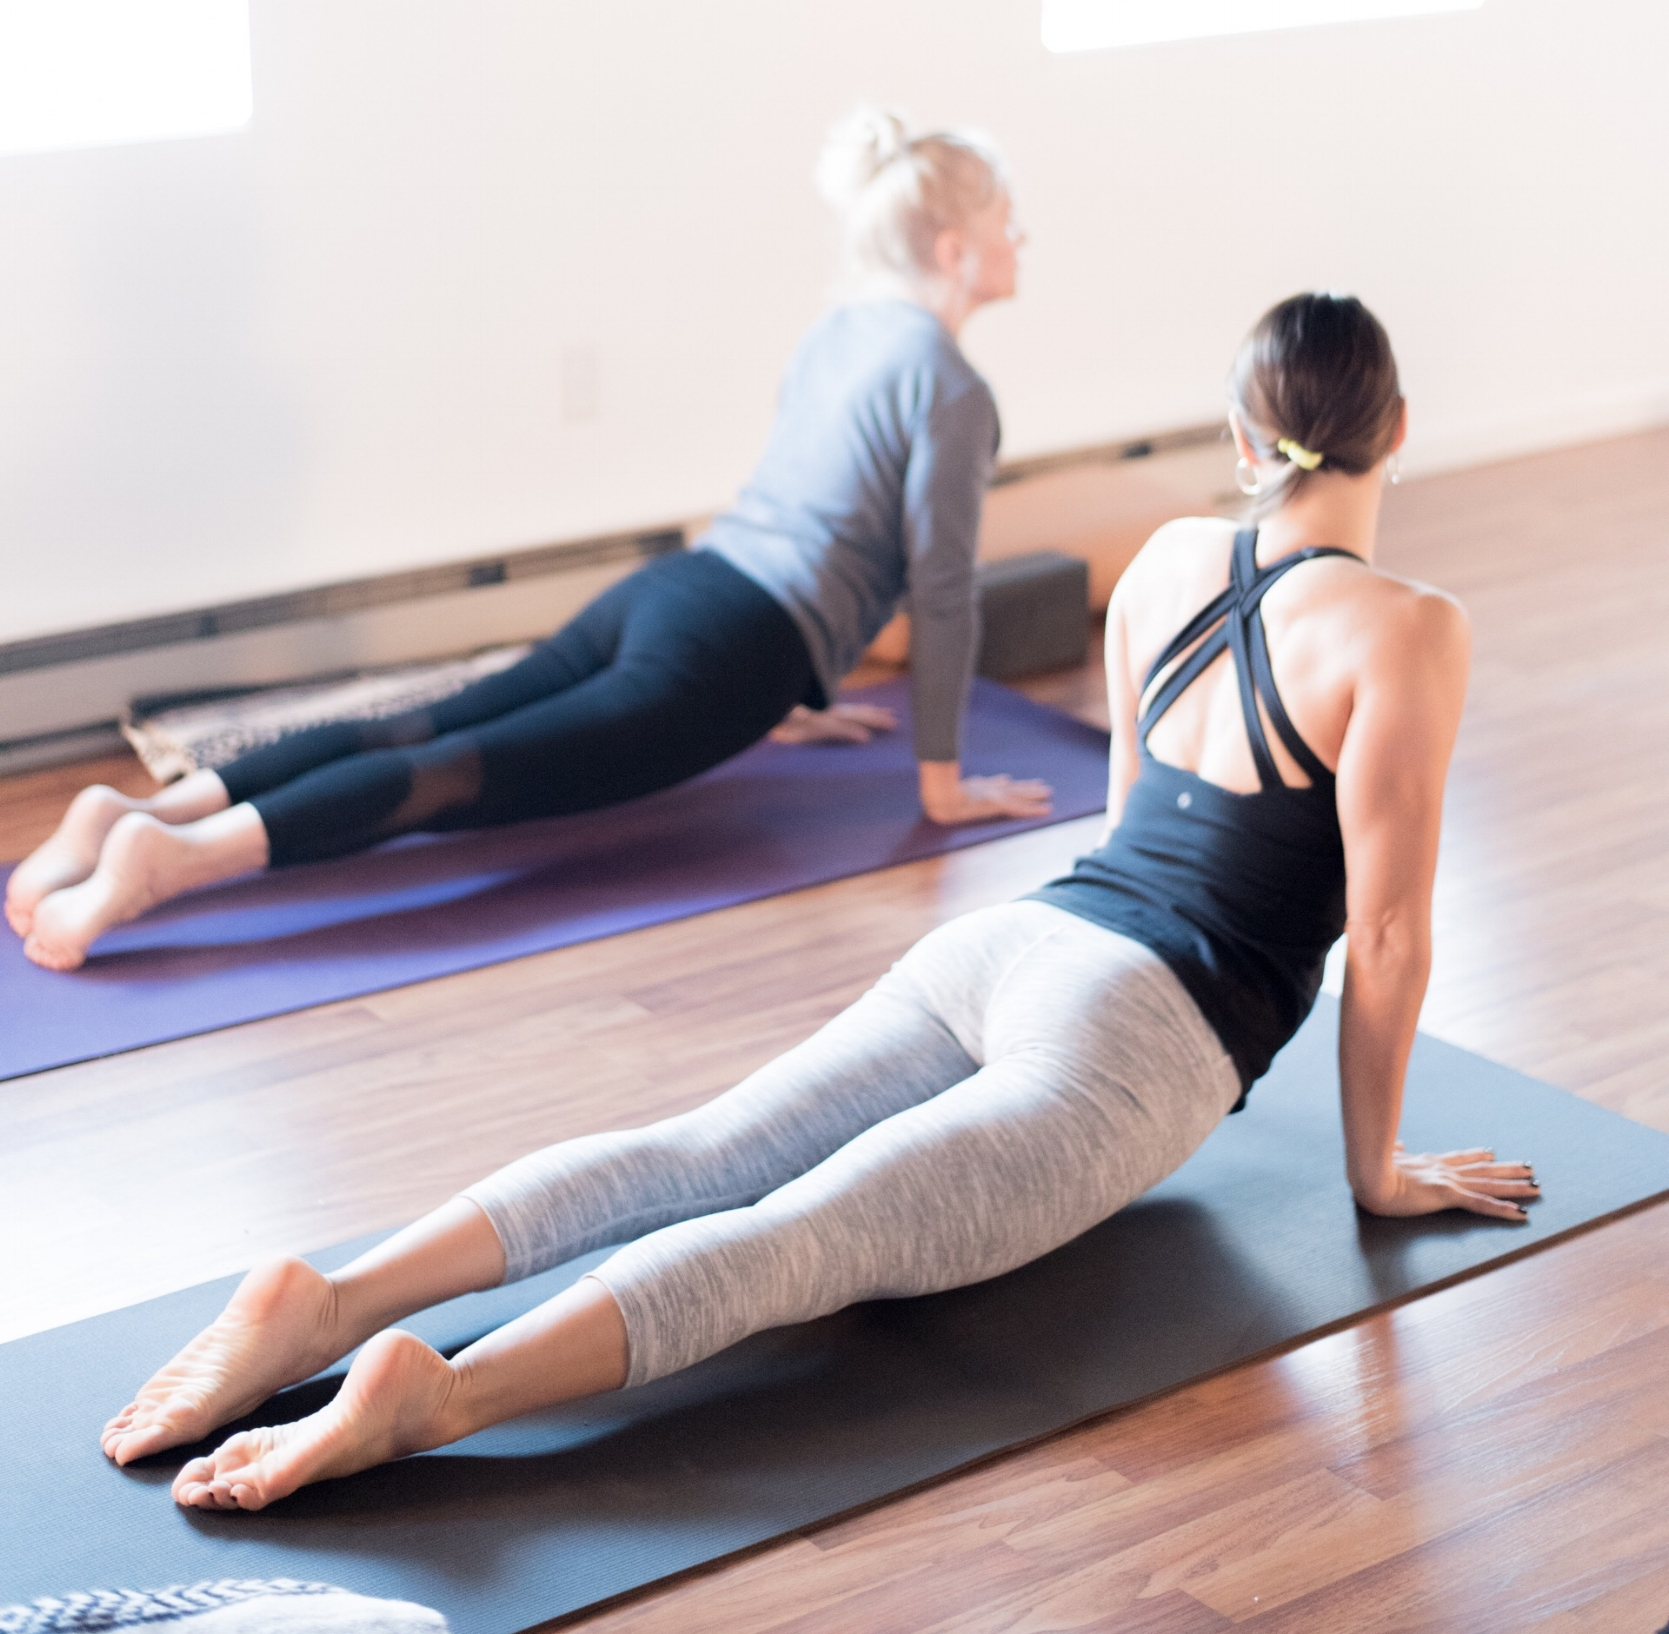 yoga 2 2017.jpeg